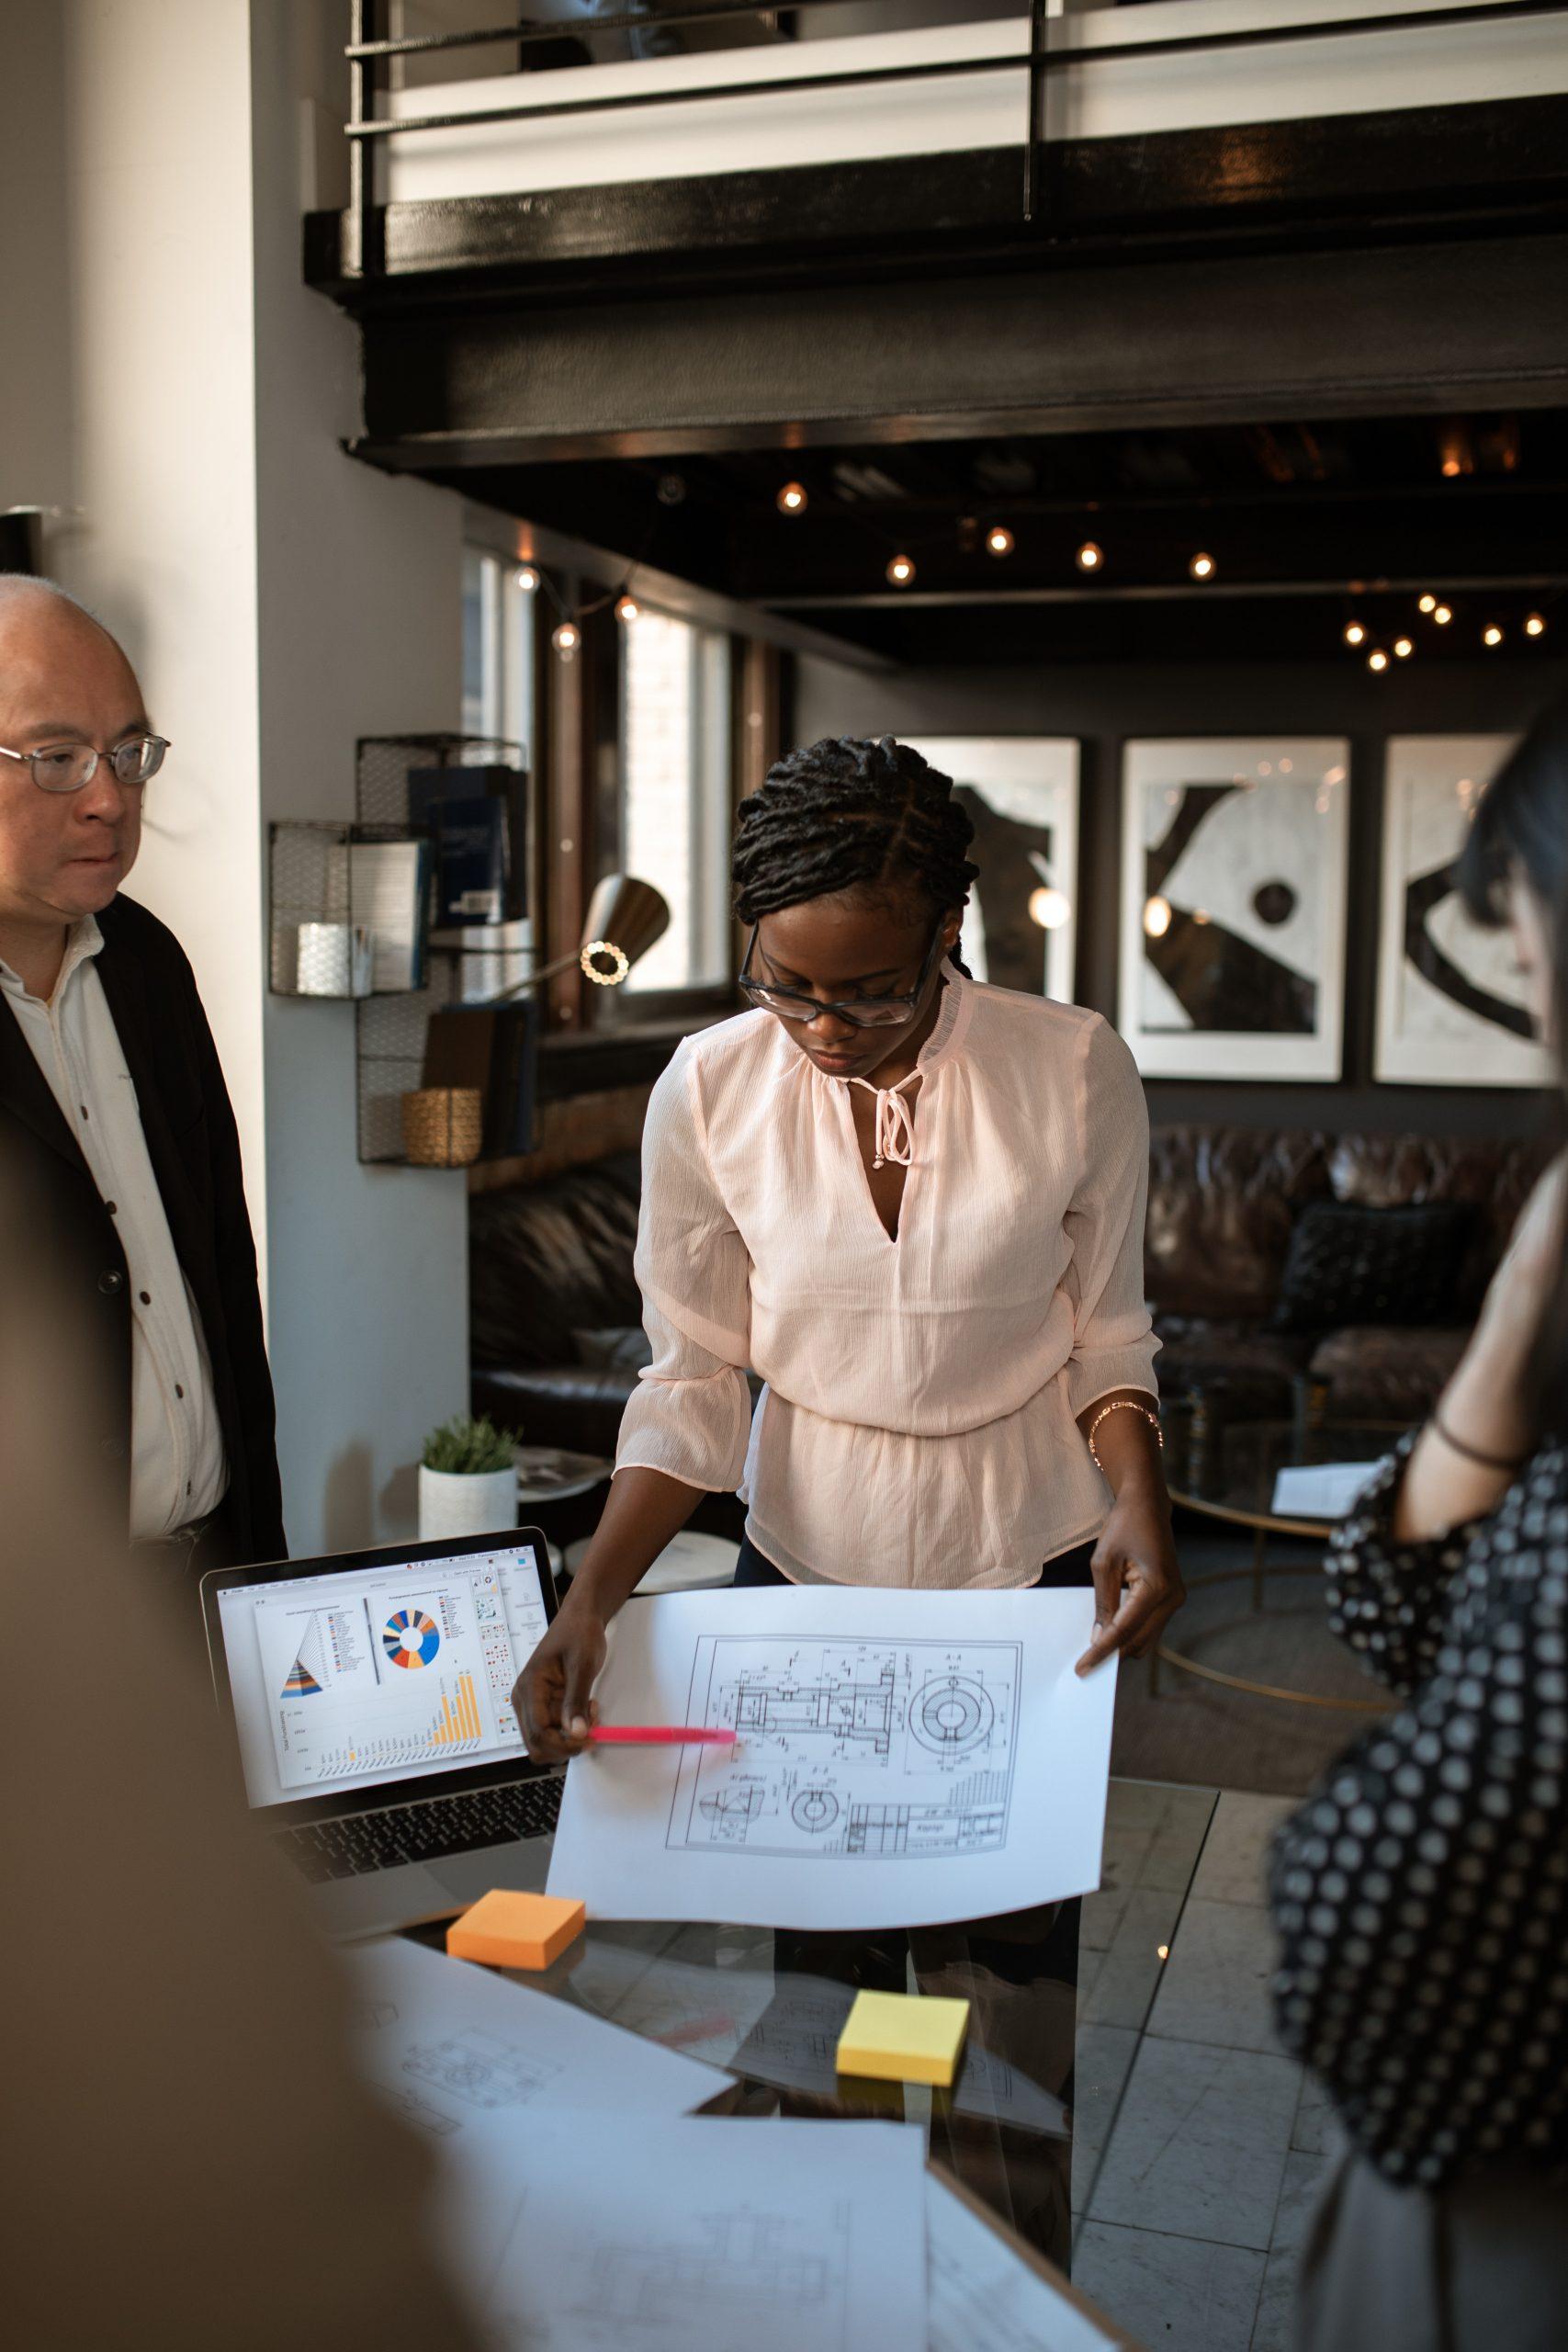 Black woman leading meeting